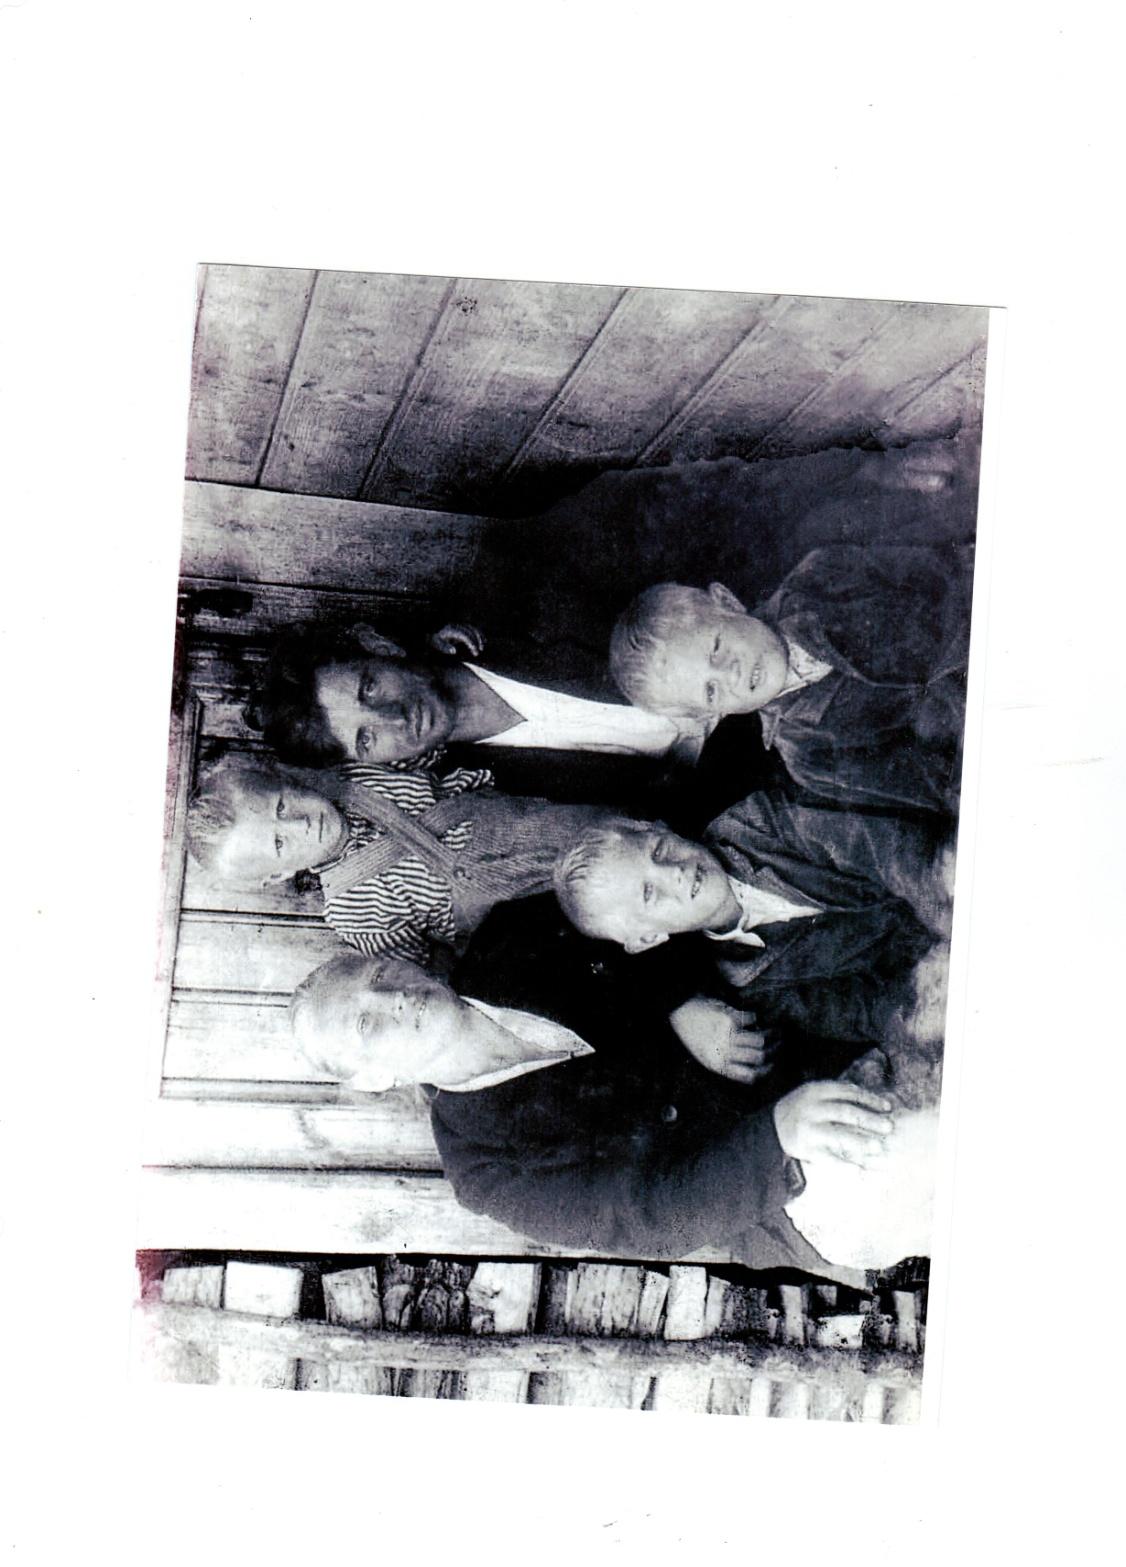 C:\Documents and Settings\Admin\Рабочий стол\Новая папка (7)\тамара Никандровна со своей семьей.jpg